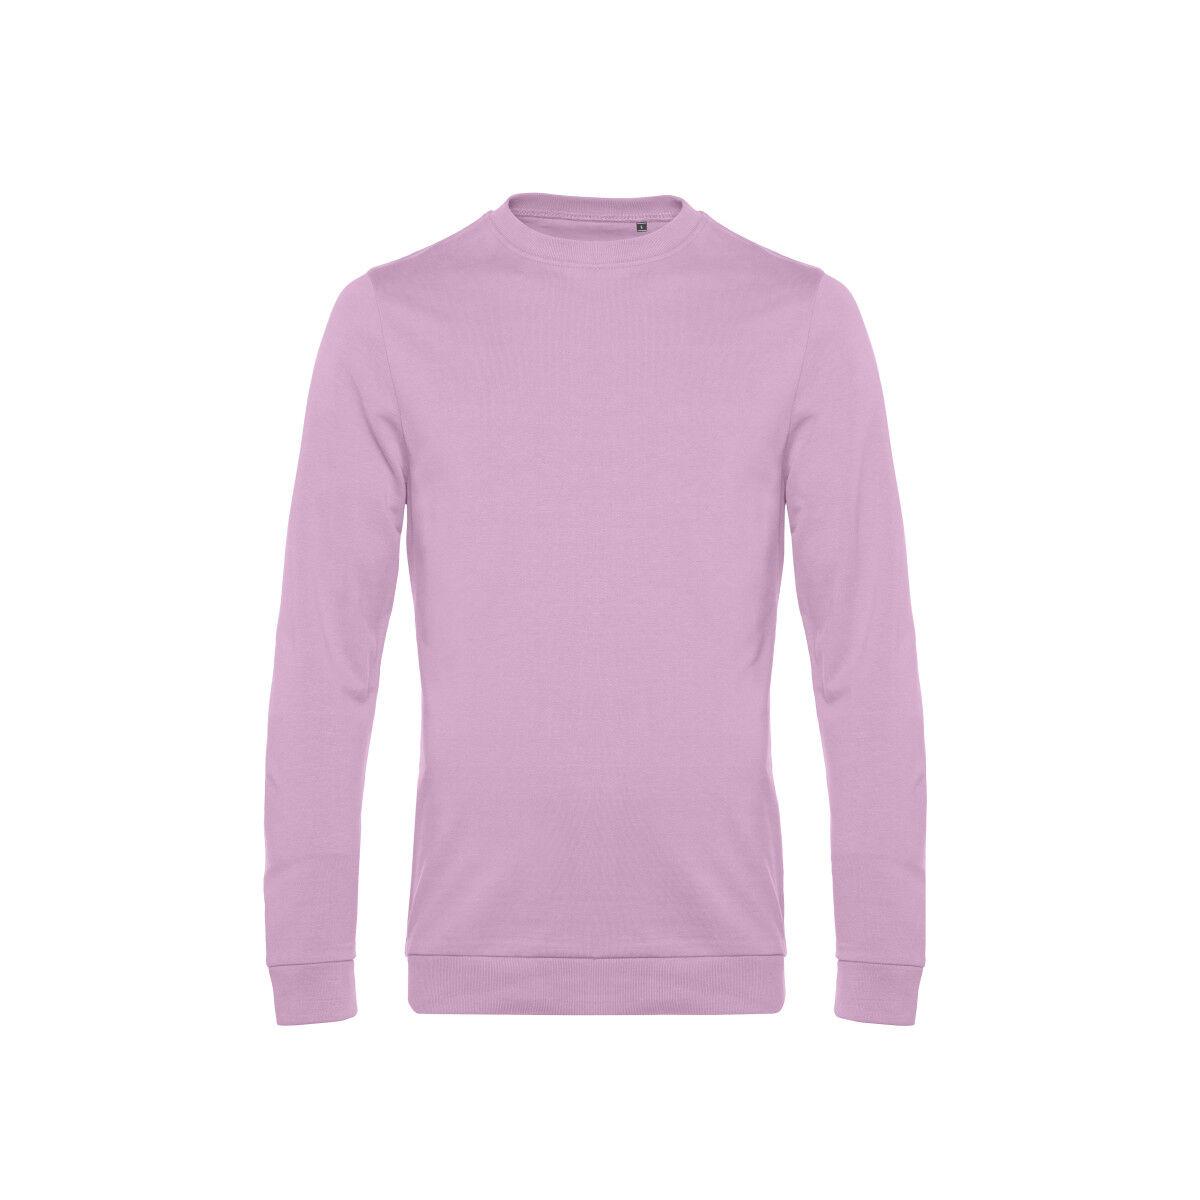 B&C Mens Set In Sweatshirt Candy Pink